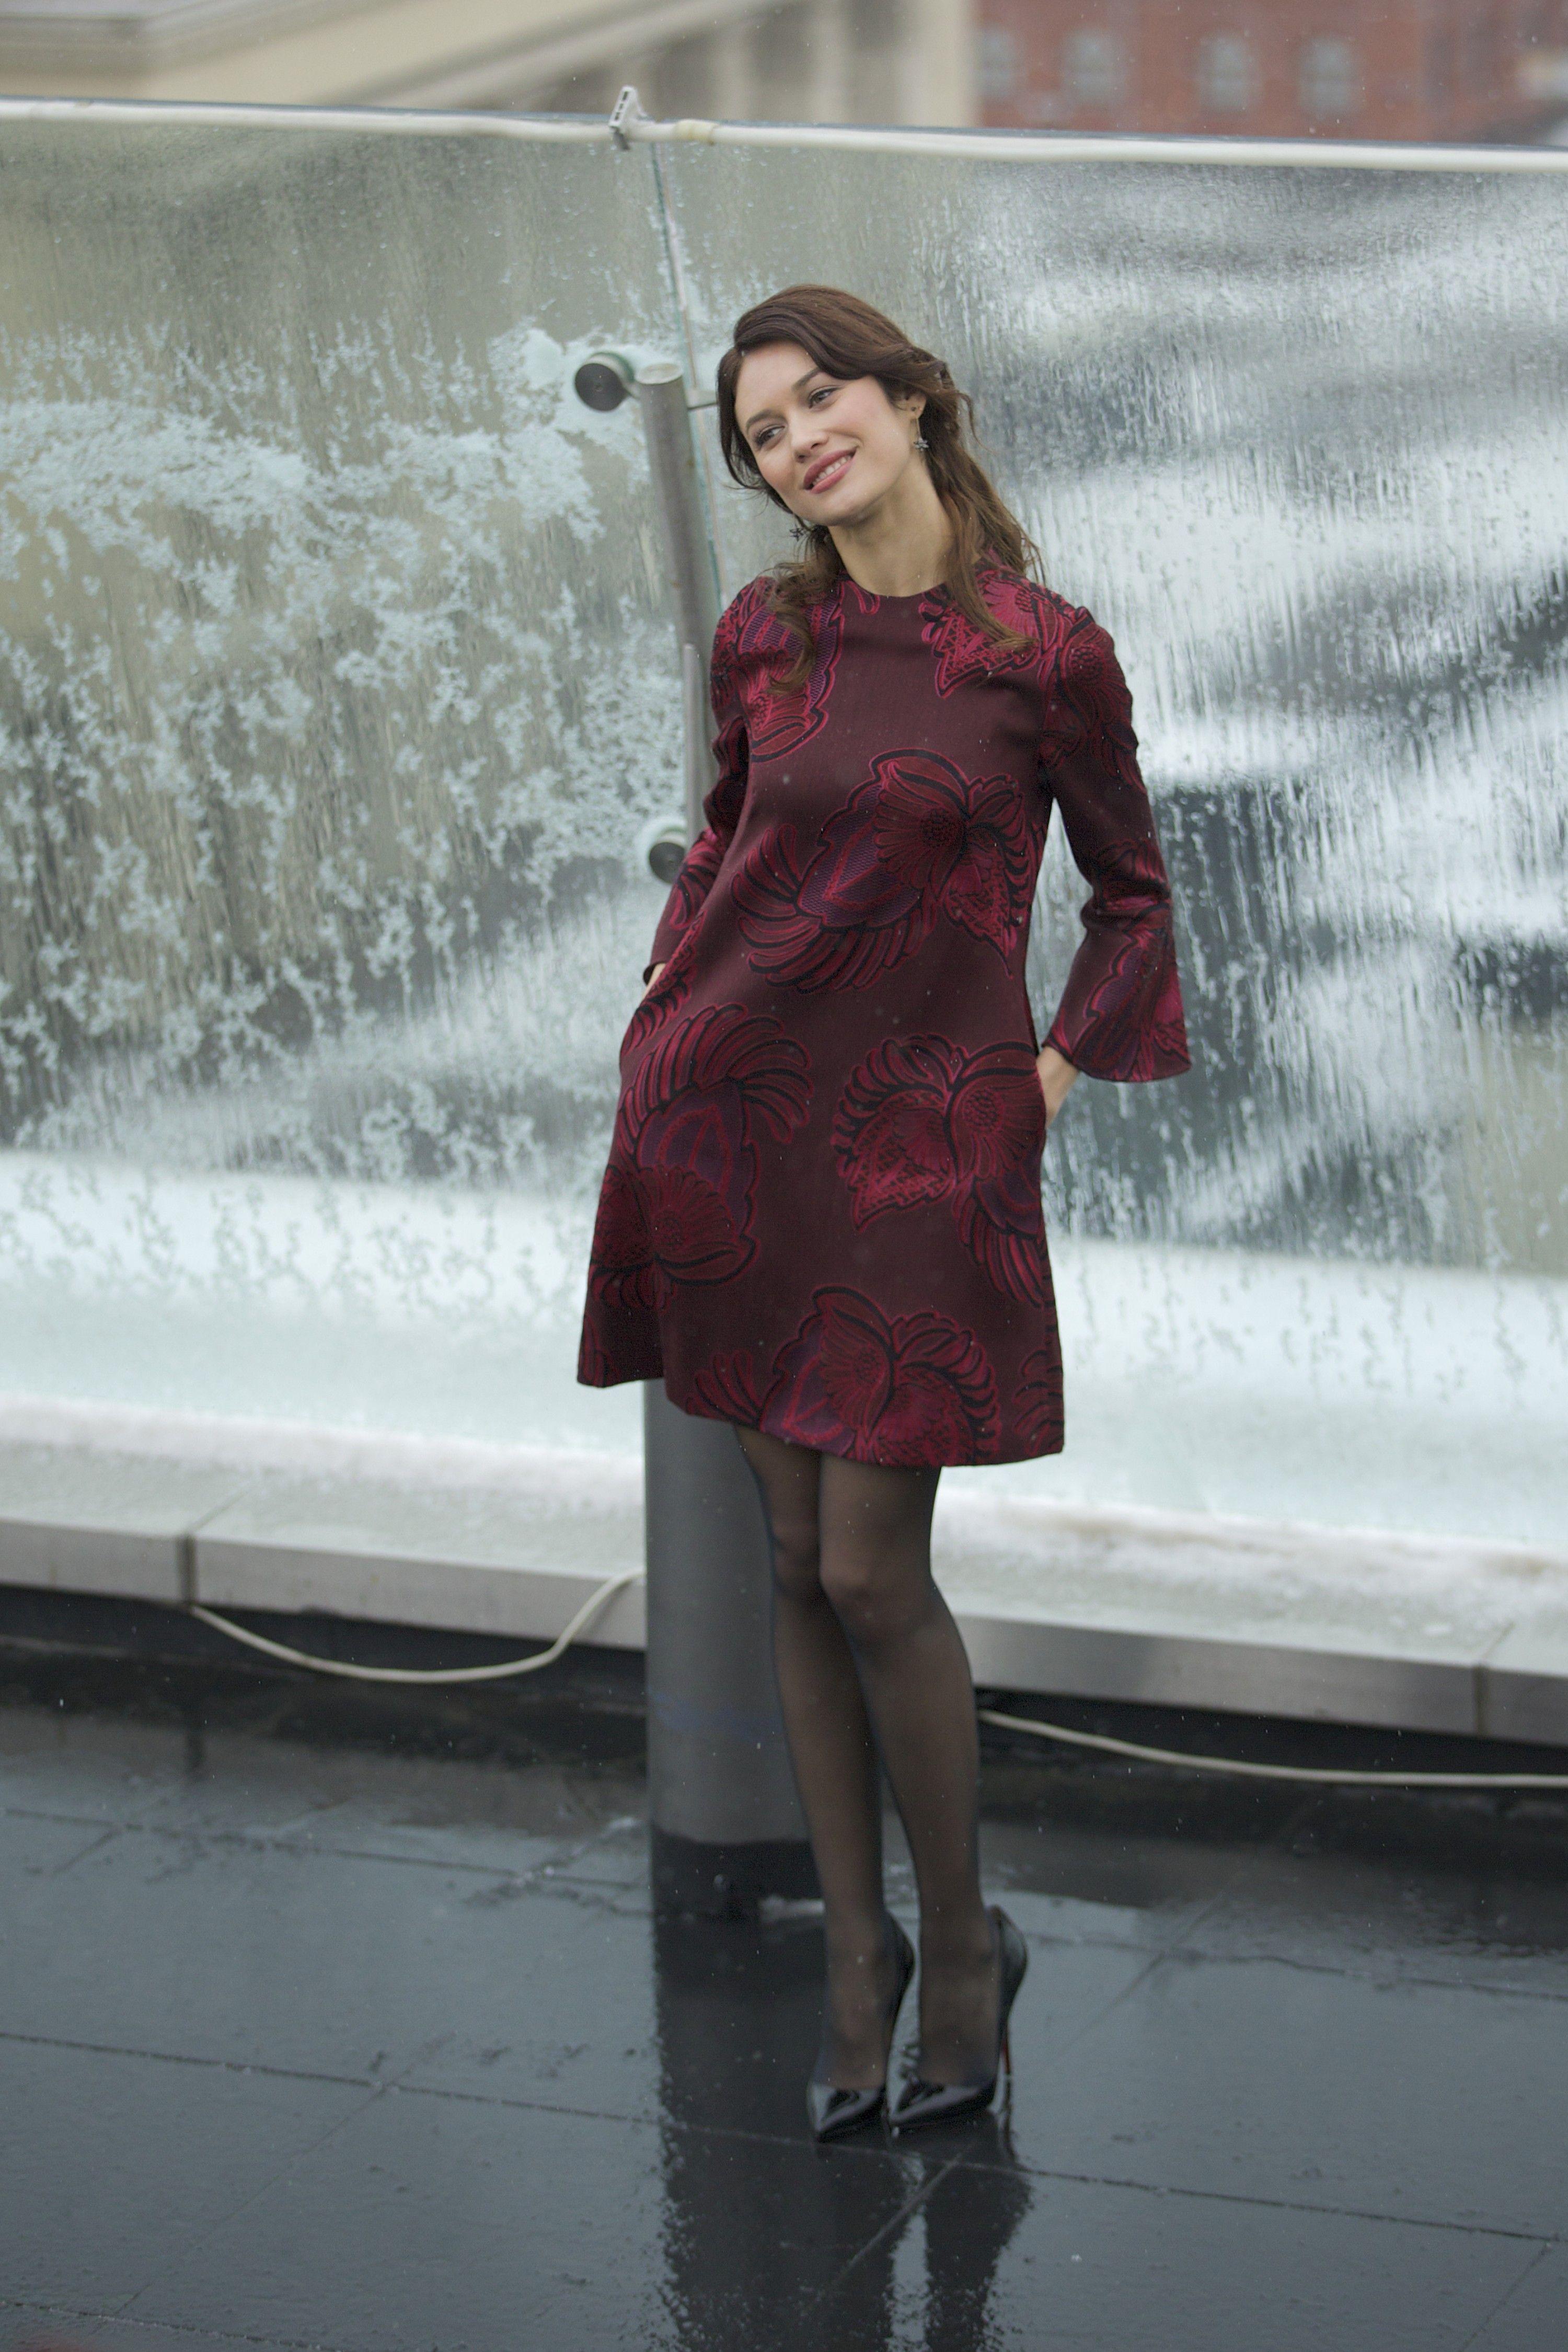 Olga Kurylenko in pantyhose - More pictures here: http ...